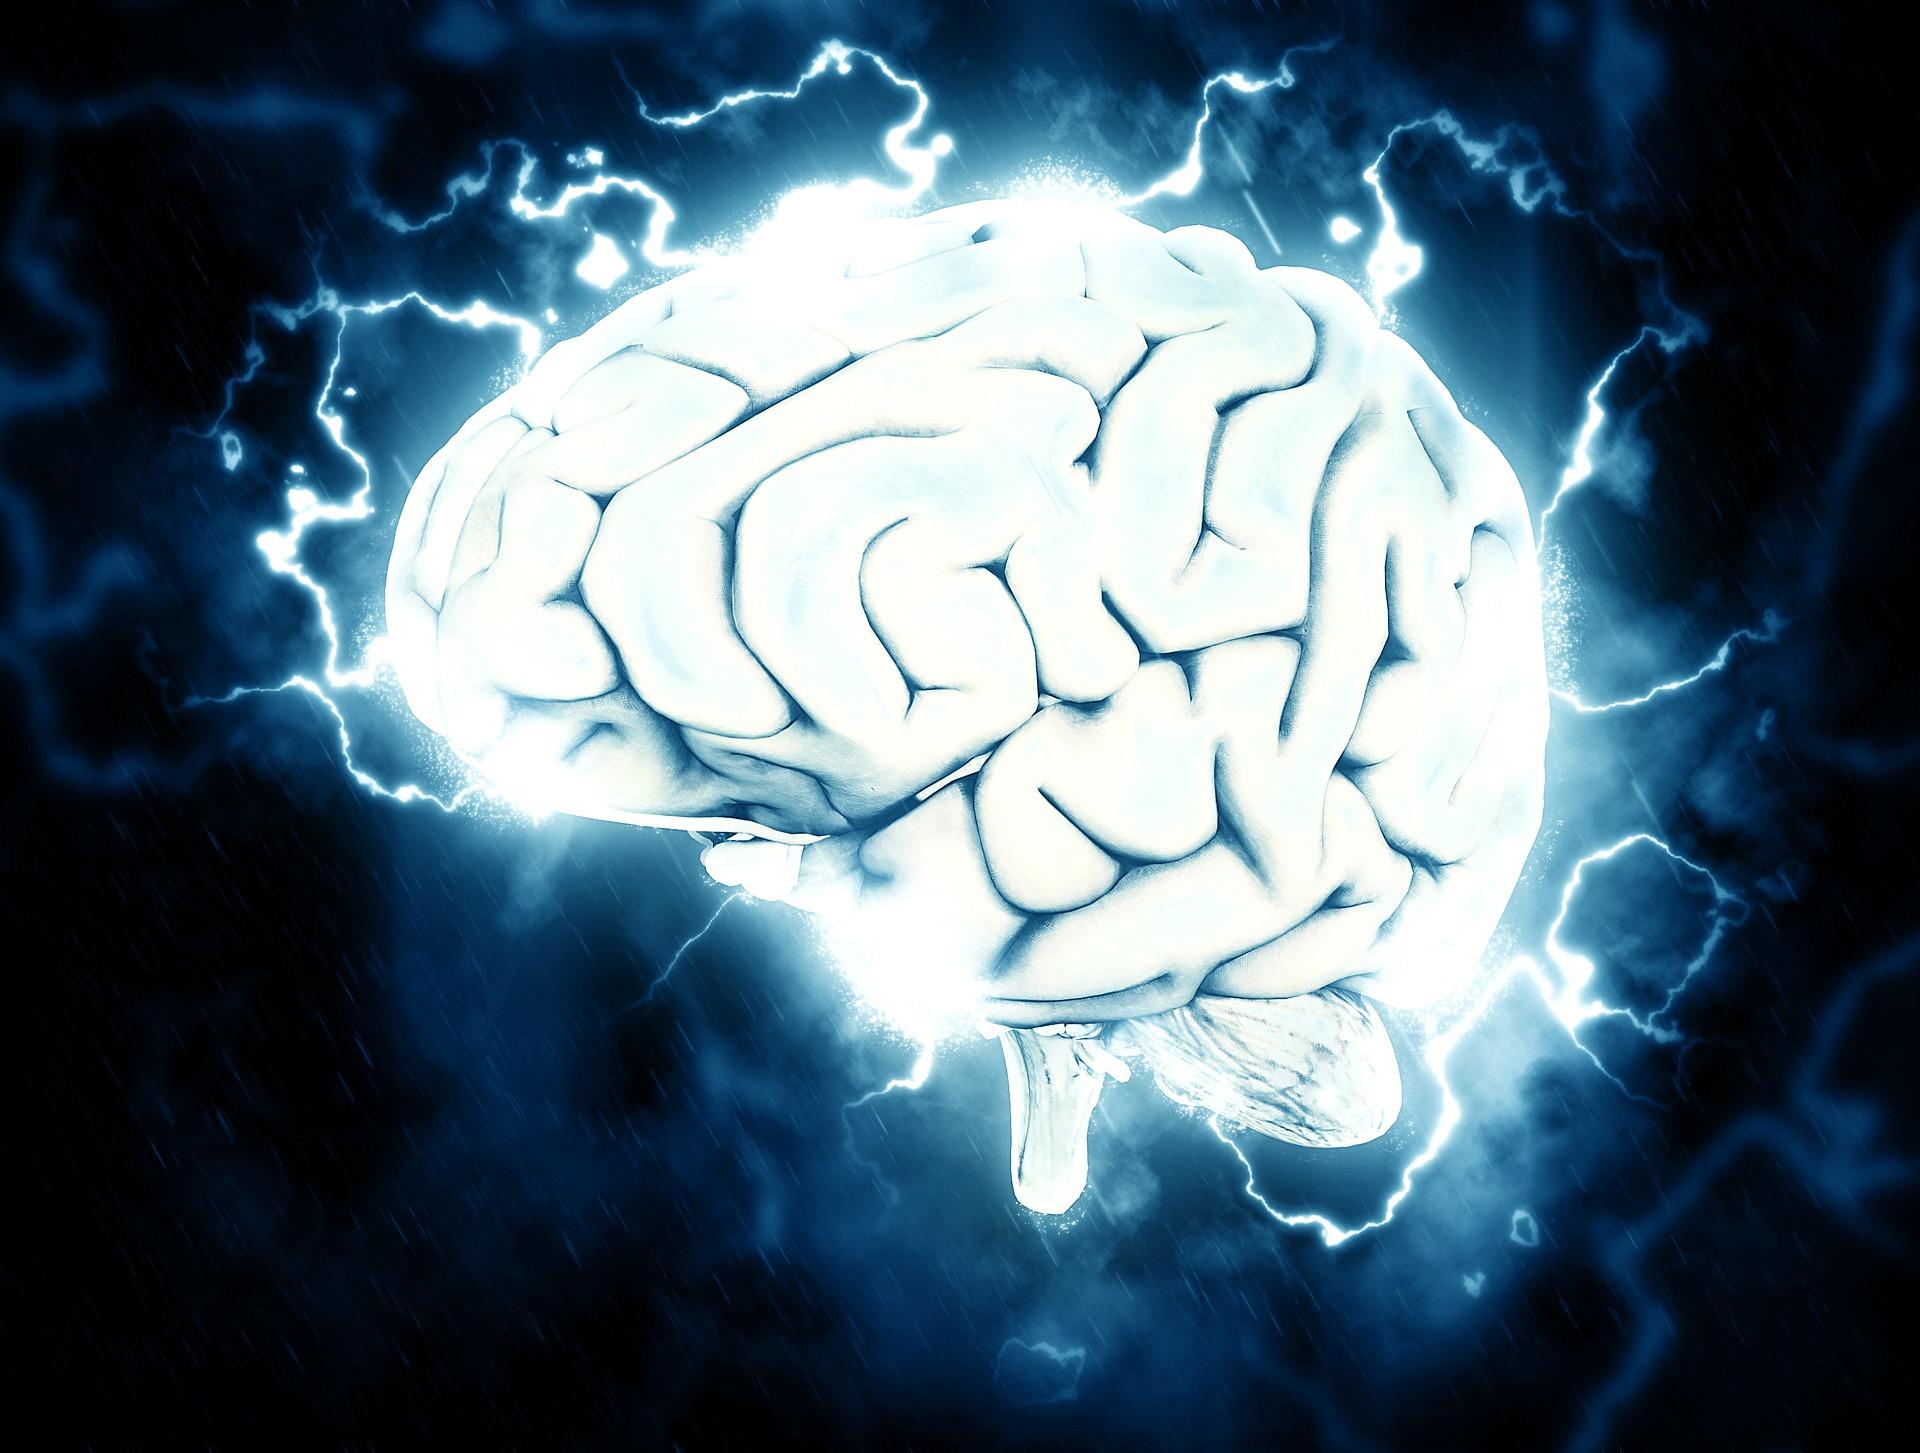 proteina netrina cervello adulto